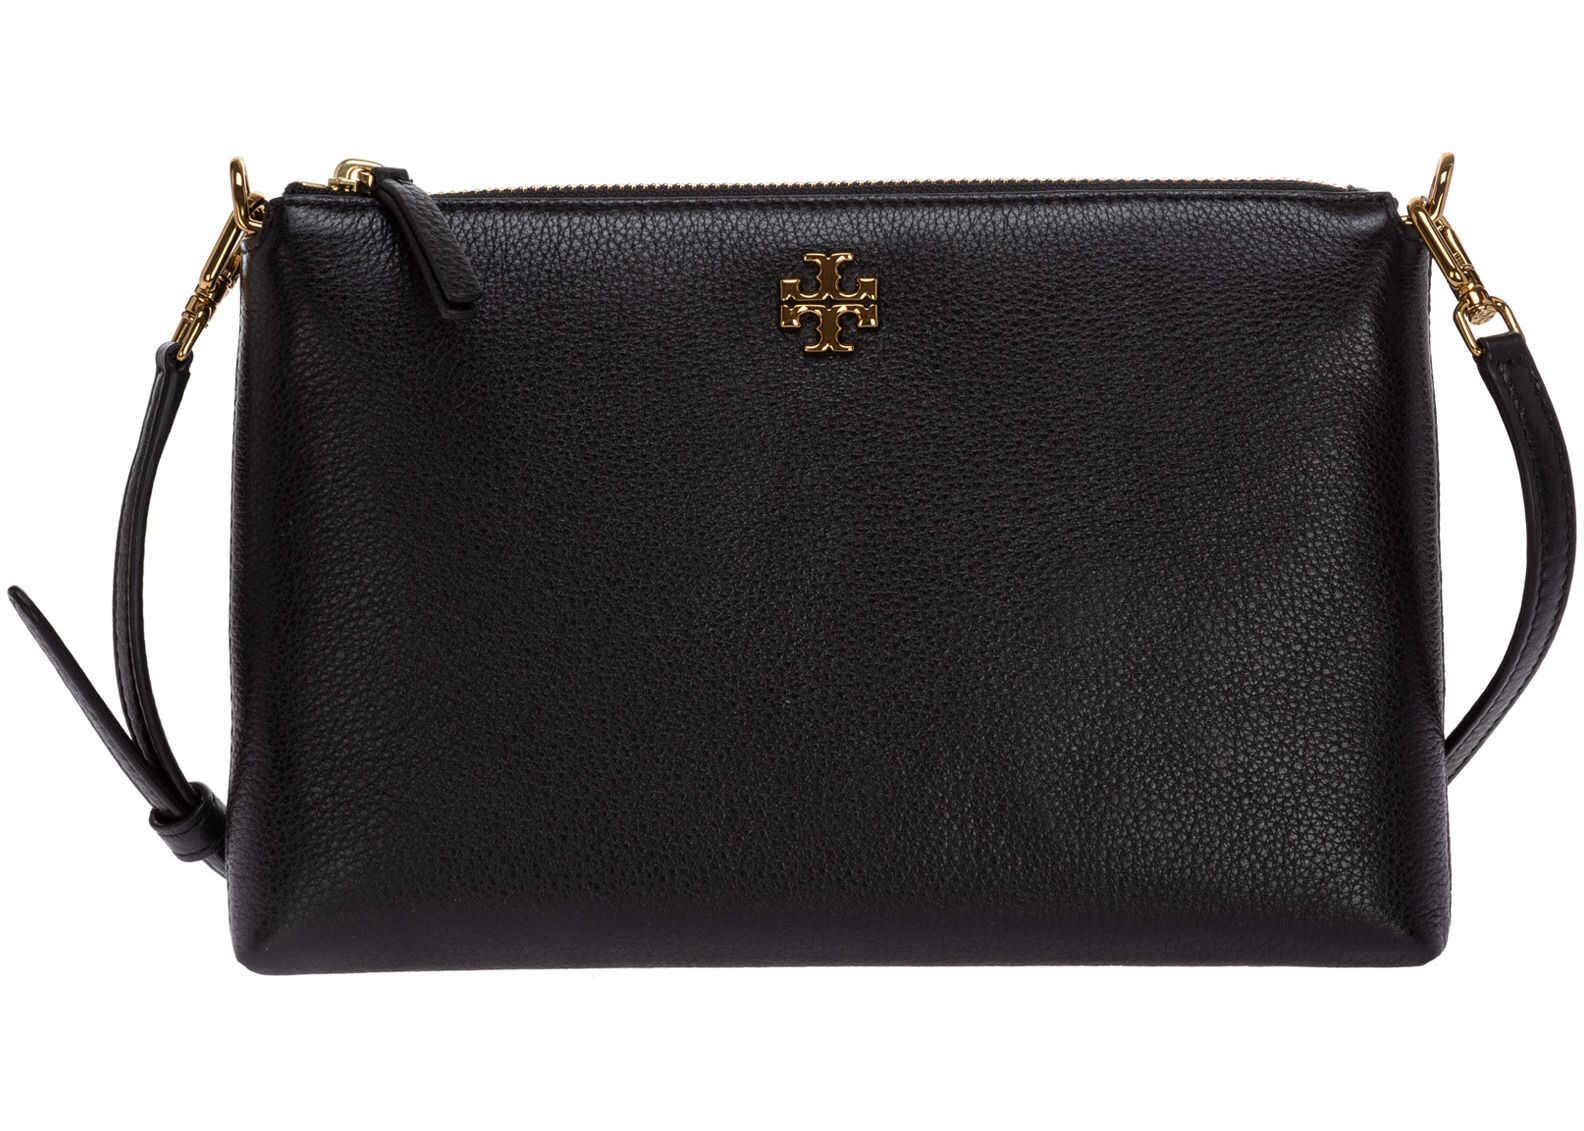 Tory Burch Bag Kira 61385 Black imagine b-mall.ro